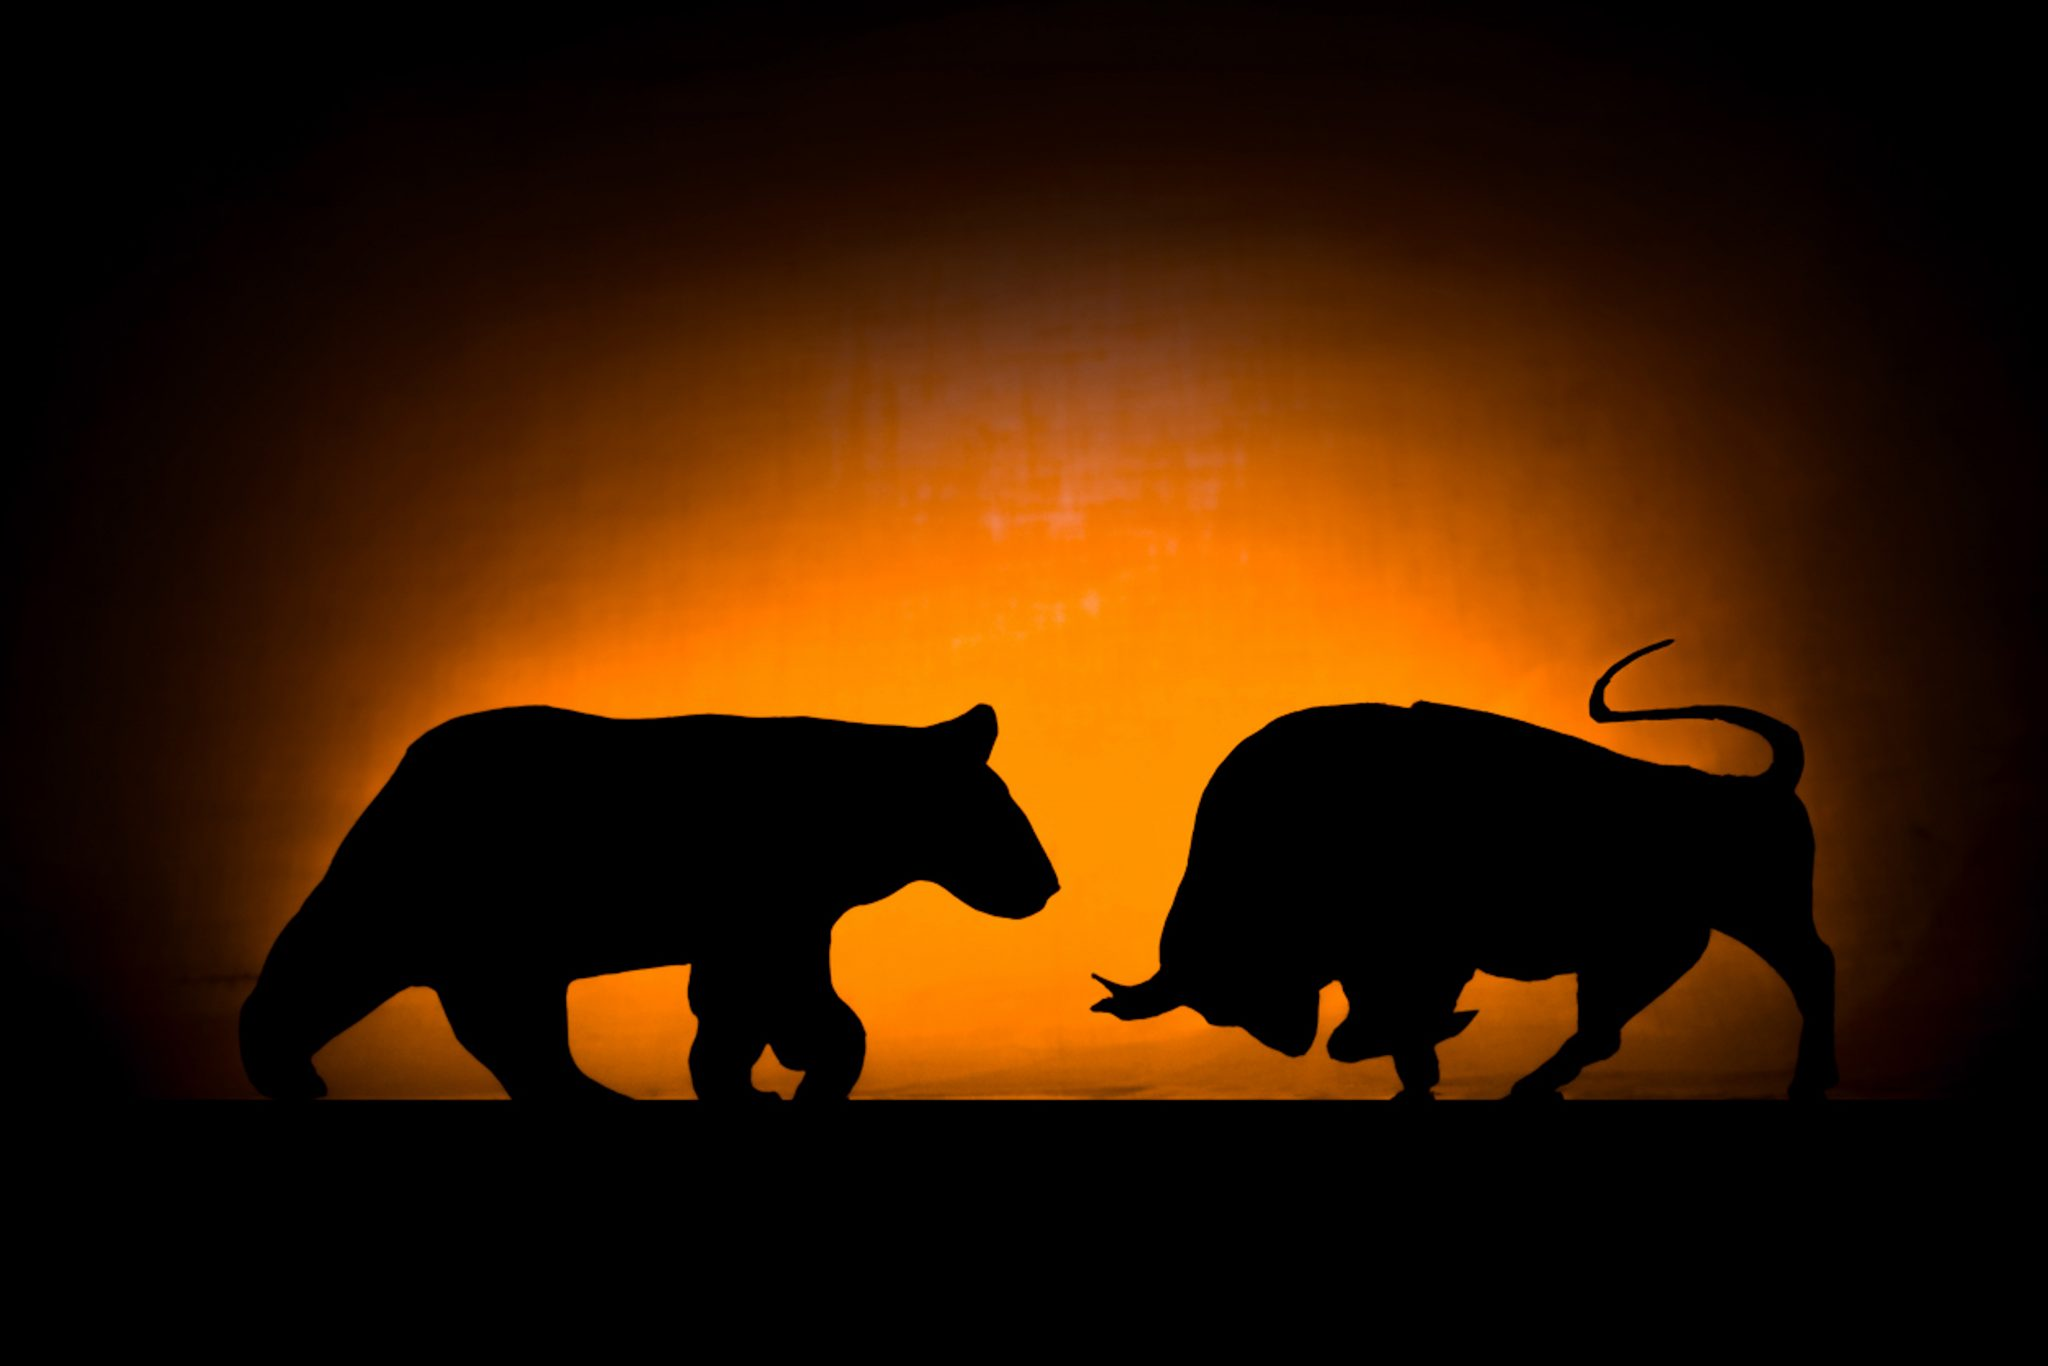 Bull market: What you need to know | Beware the bear? | Moneyfarm